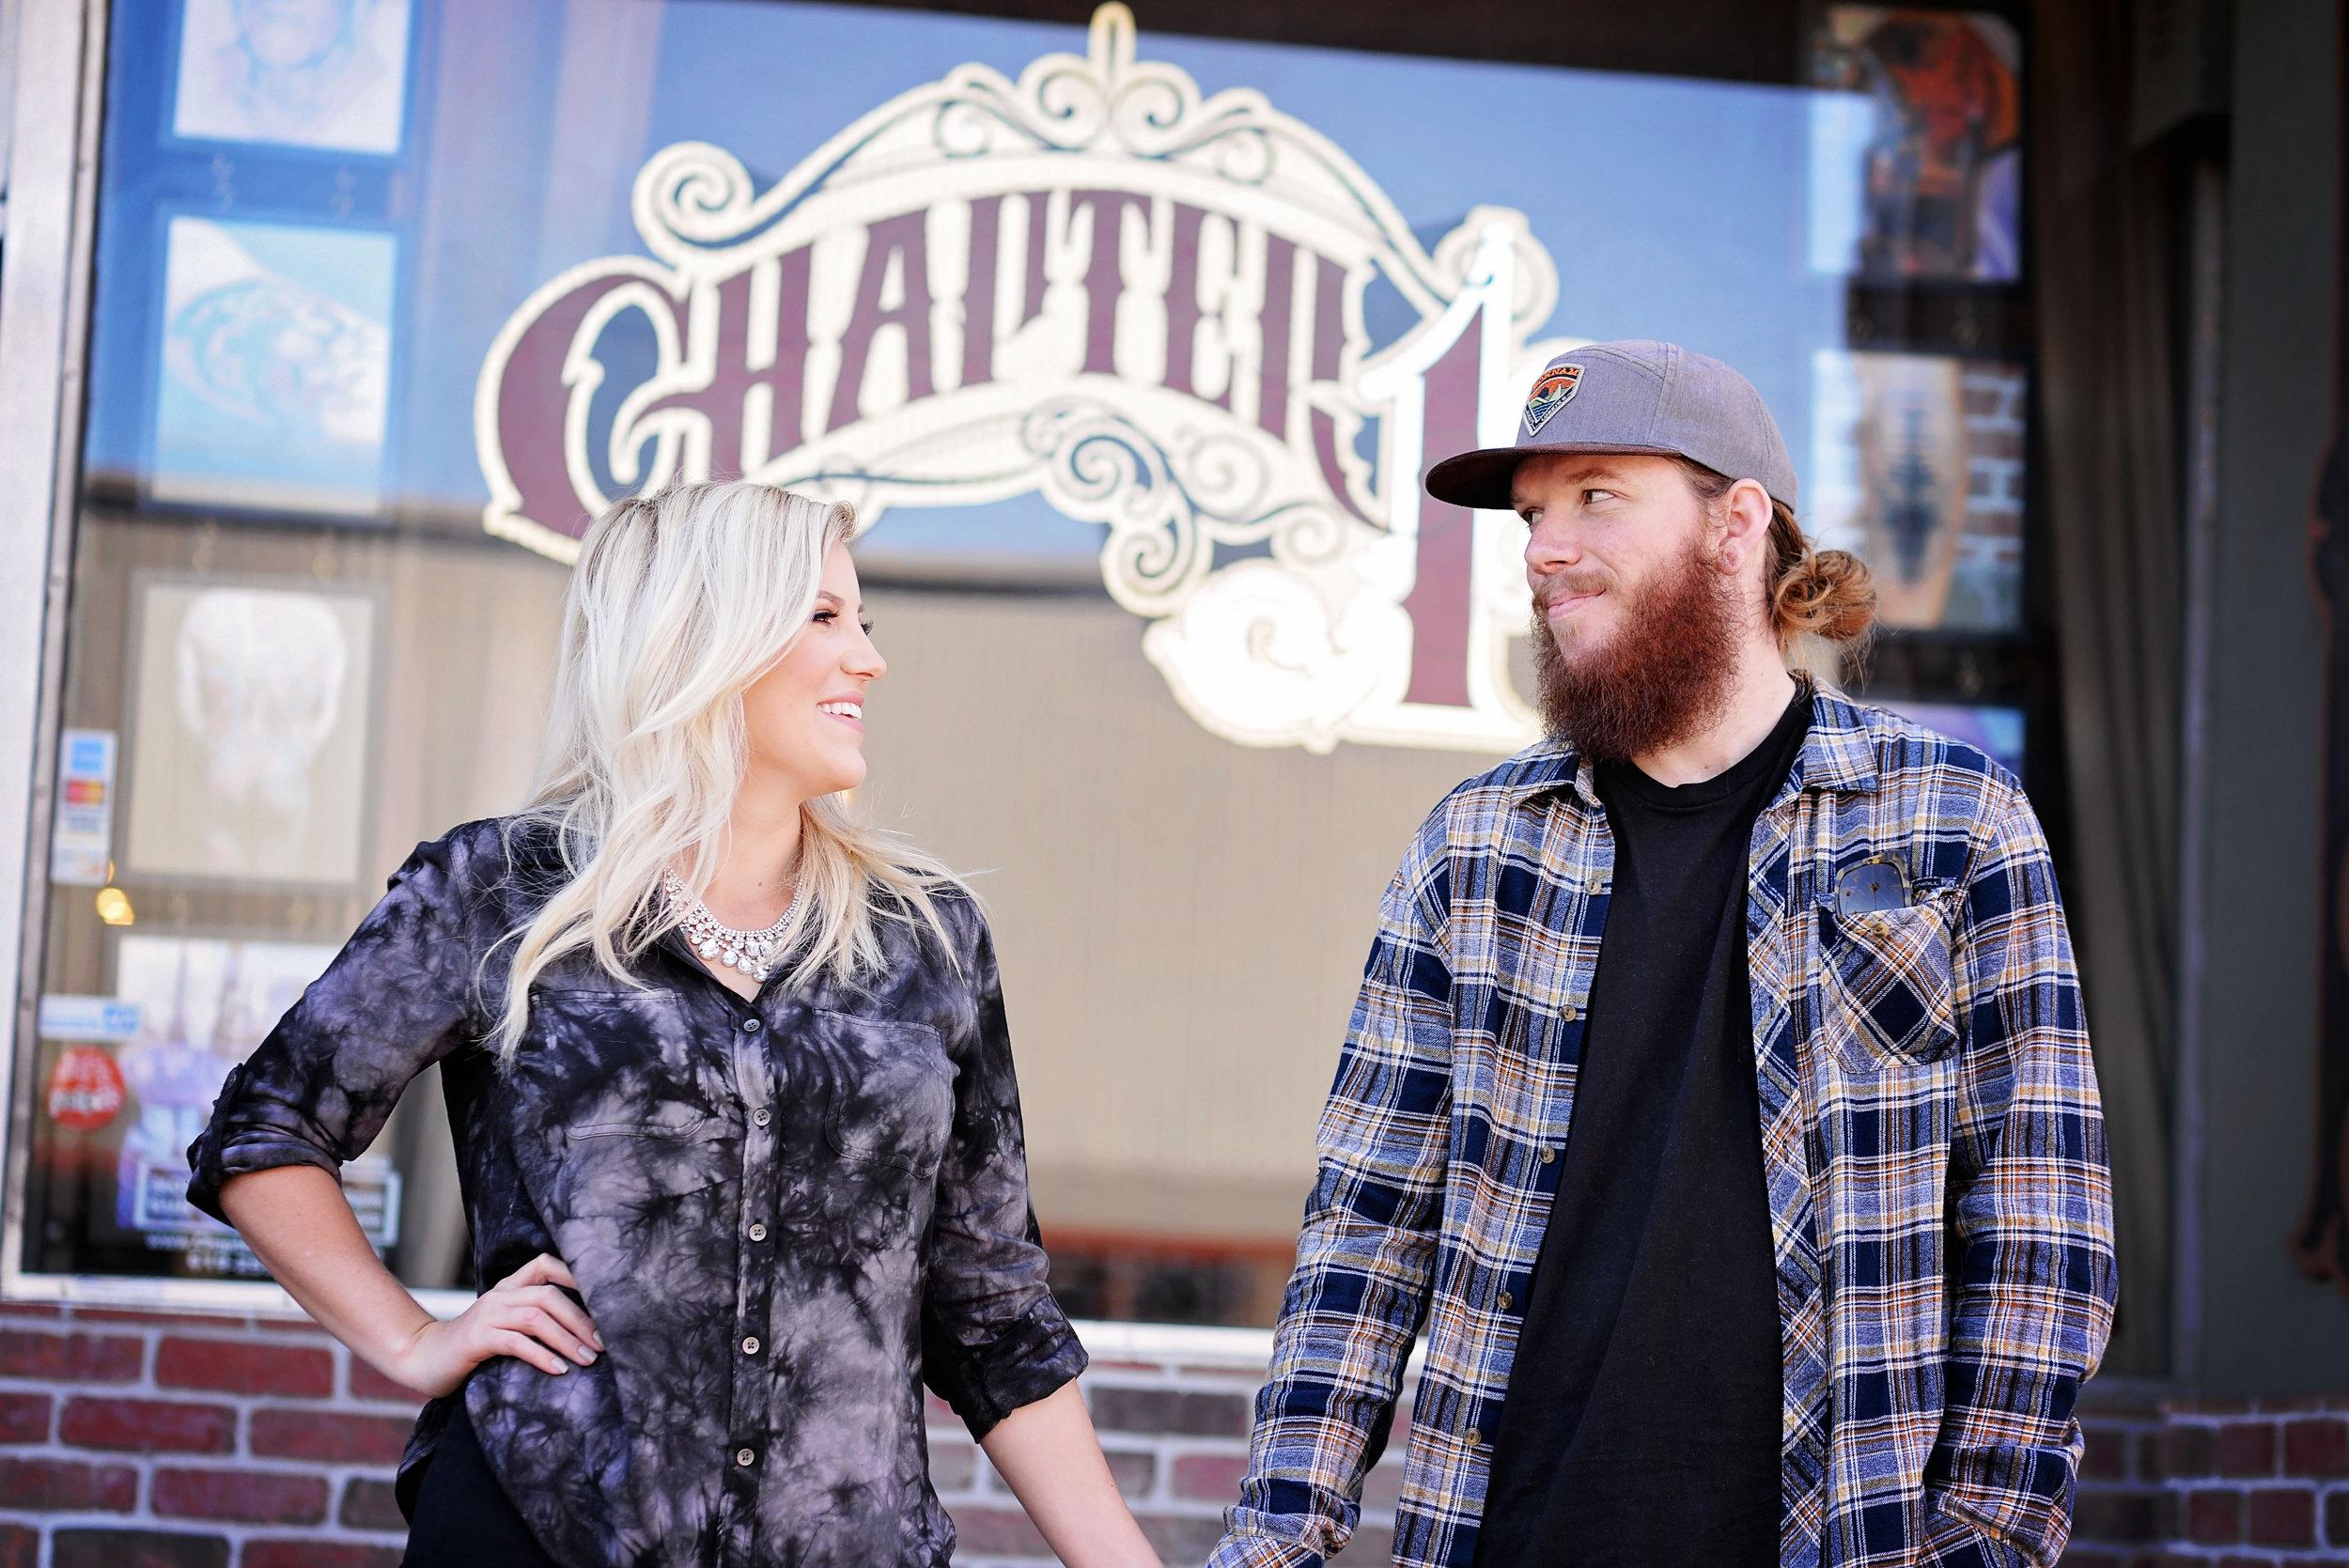 Megan Jimmy Engaged Chapter 1 Tattoo Ocean Beach-Edits-0041.jpg